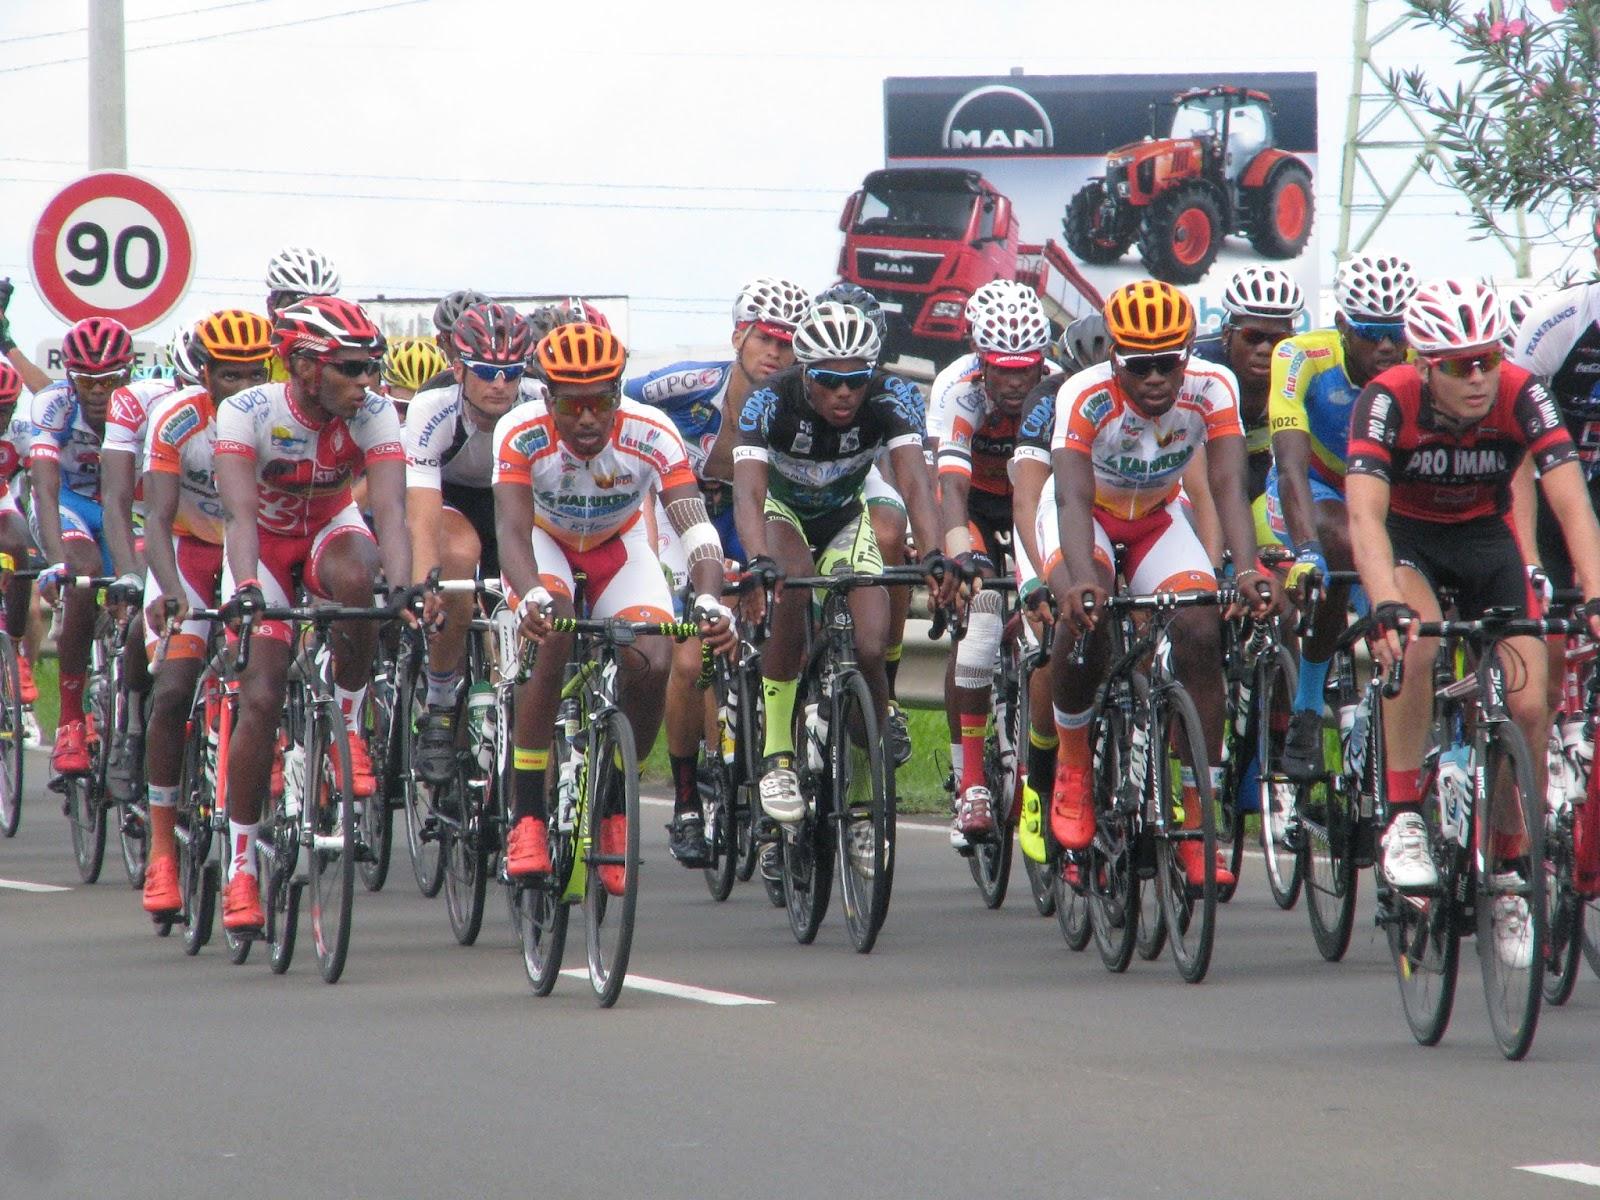 Le relais 39 39 ultramarin 39 39 2016 66 me tour cycliste de for La 9eme porte